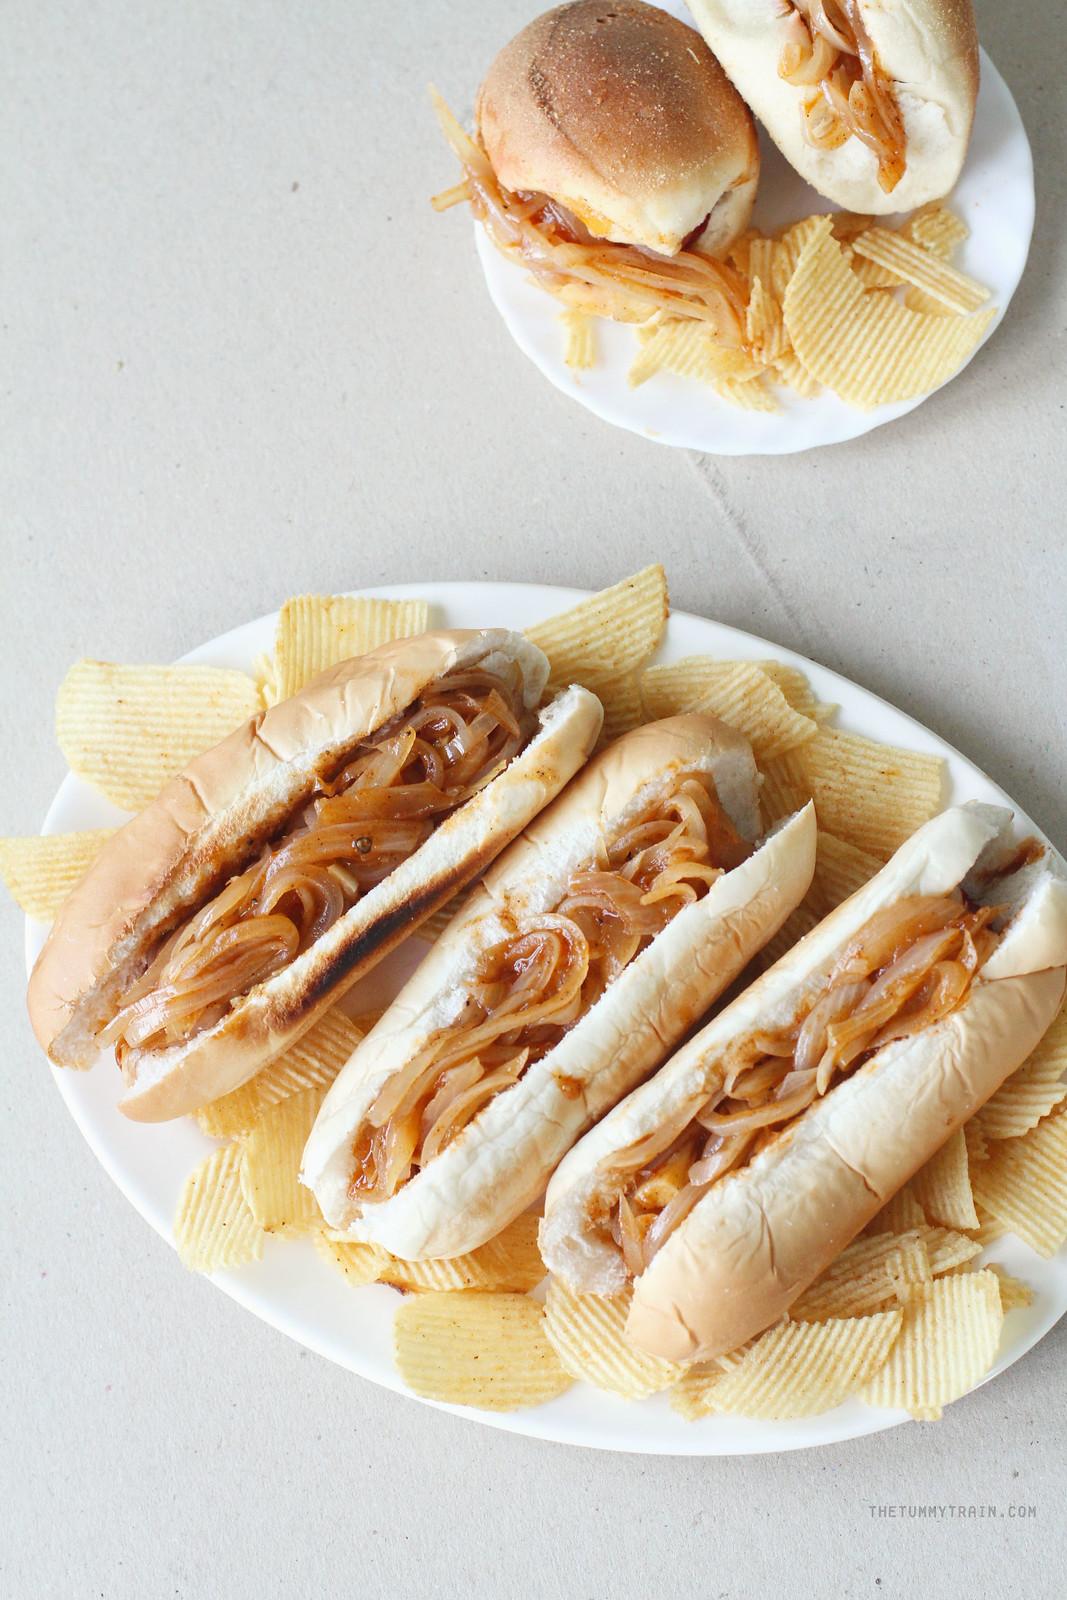 29835691551 e9cbb43d06 h - Making New York-Style Hotdogs with Bibbo Hotdogs